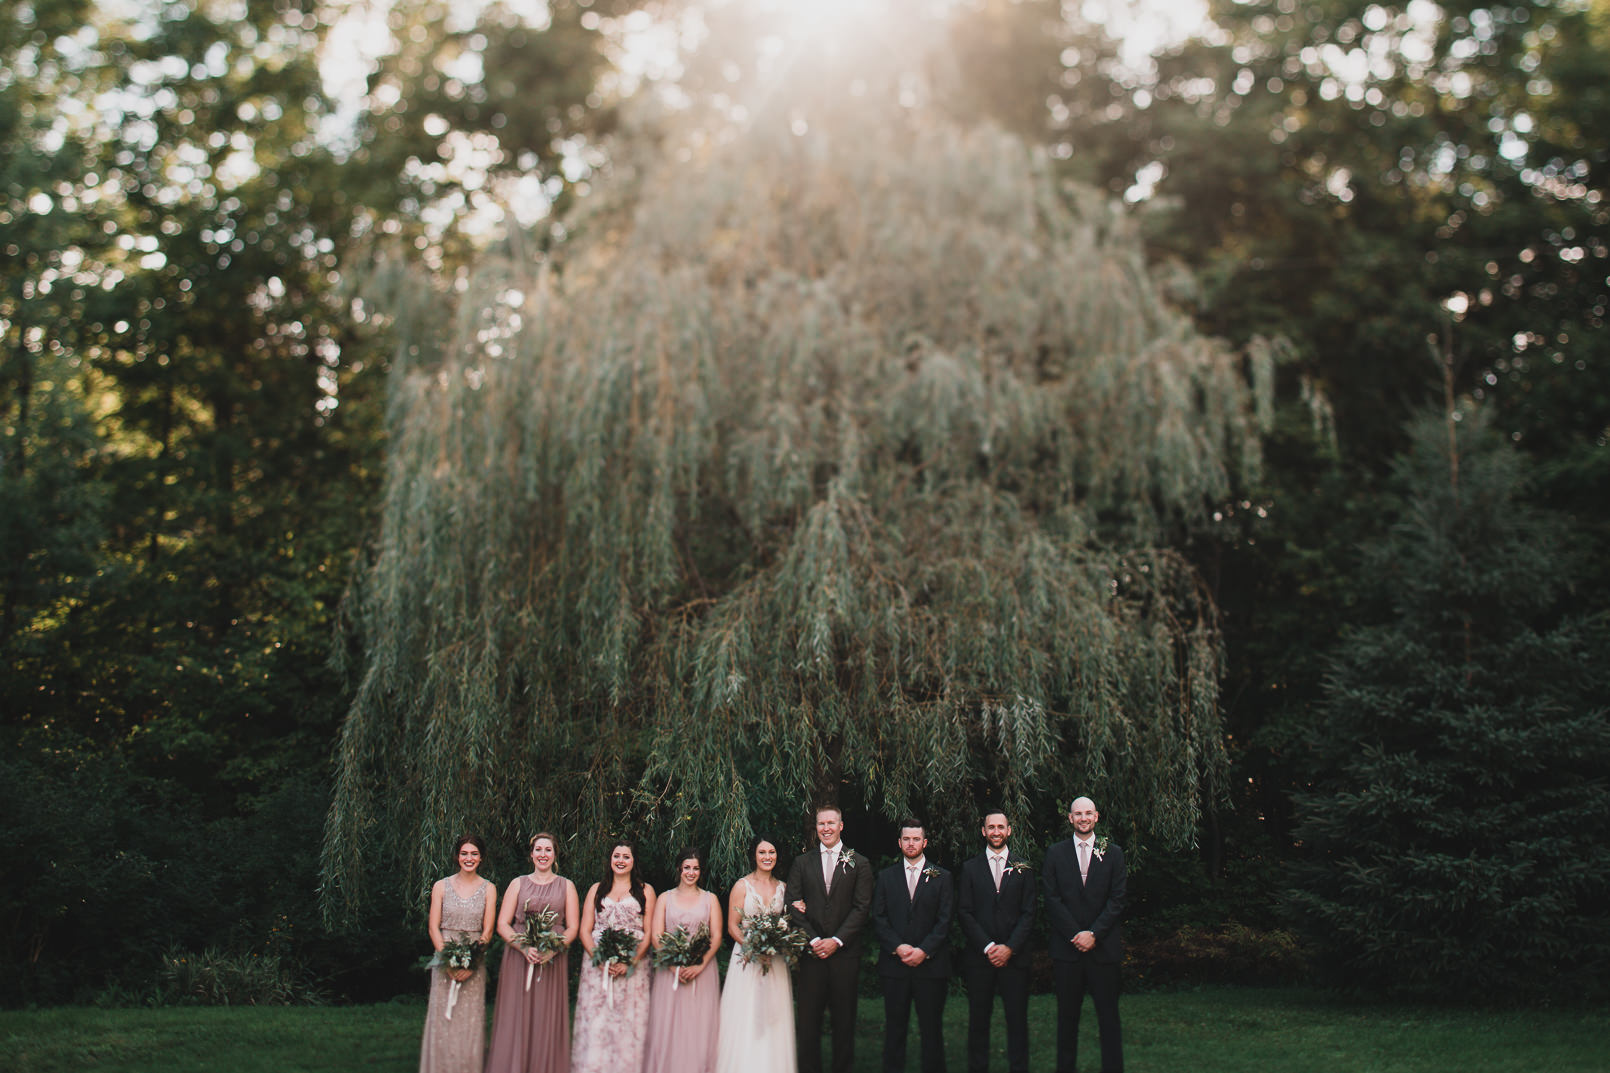 013-Jonathan-Kuhn-Photography-Wedding-_mini.jpg